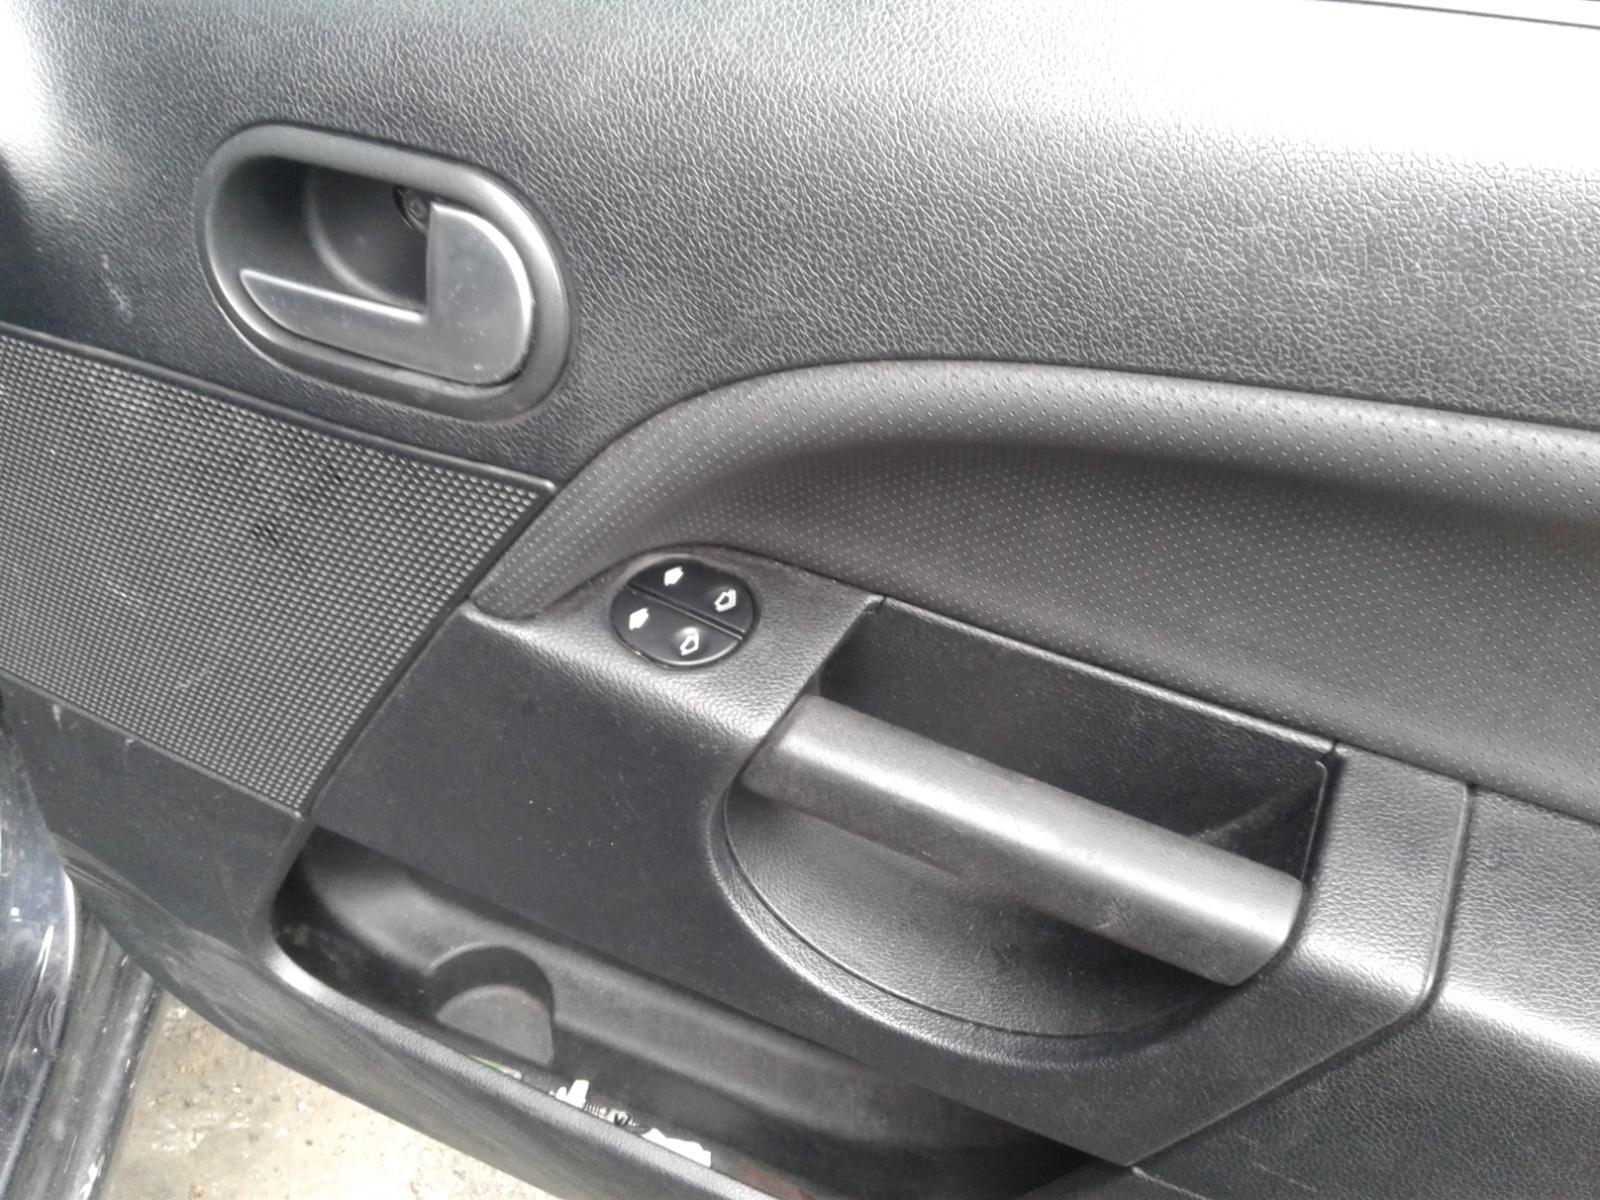 View Auto part FORD FIESTA 2007 3 Door Hatchback